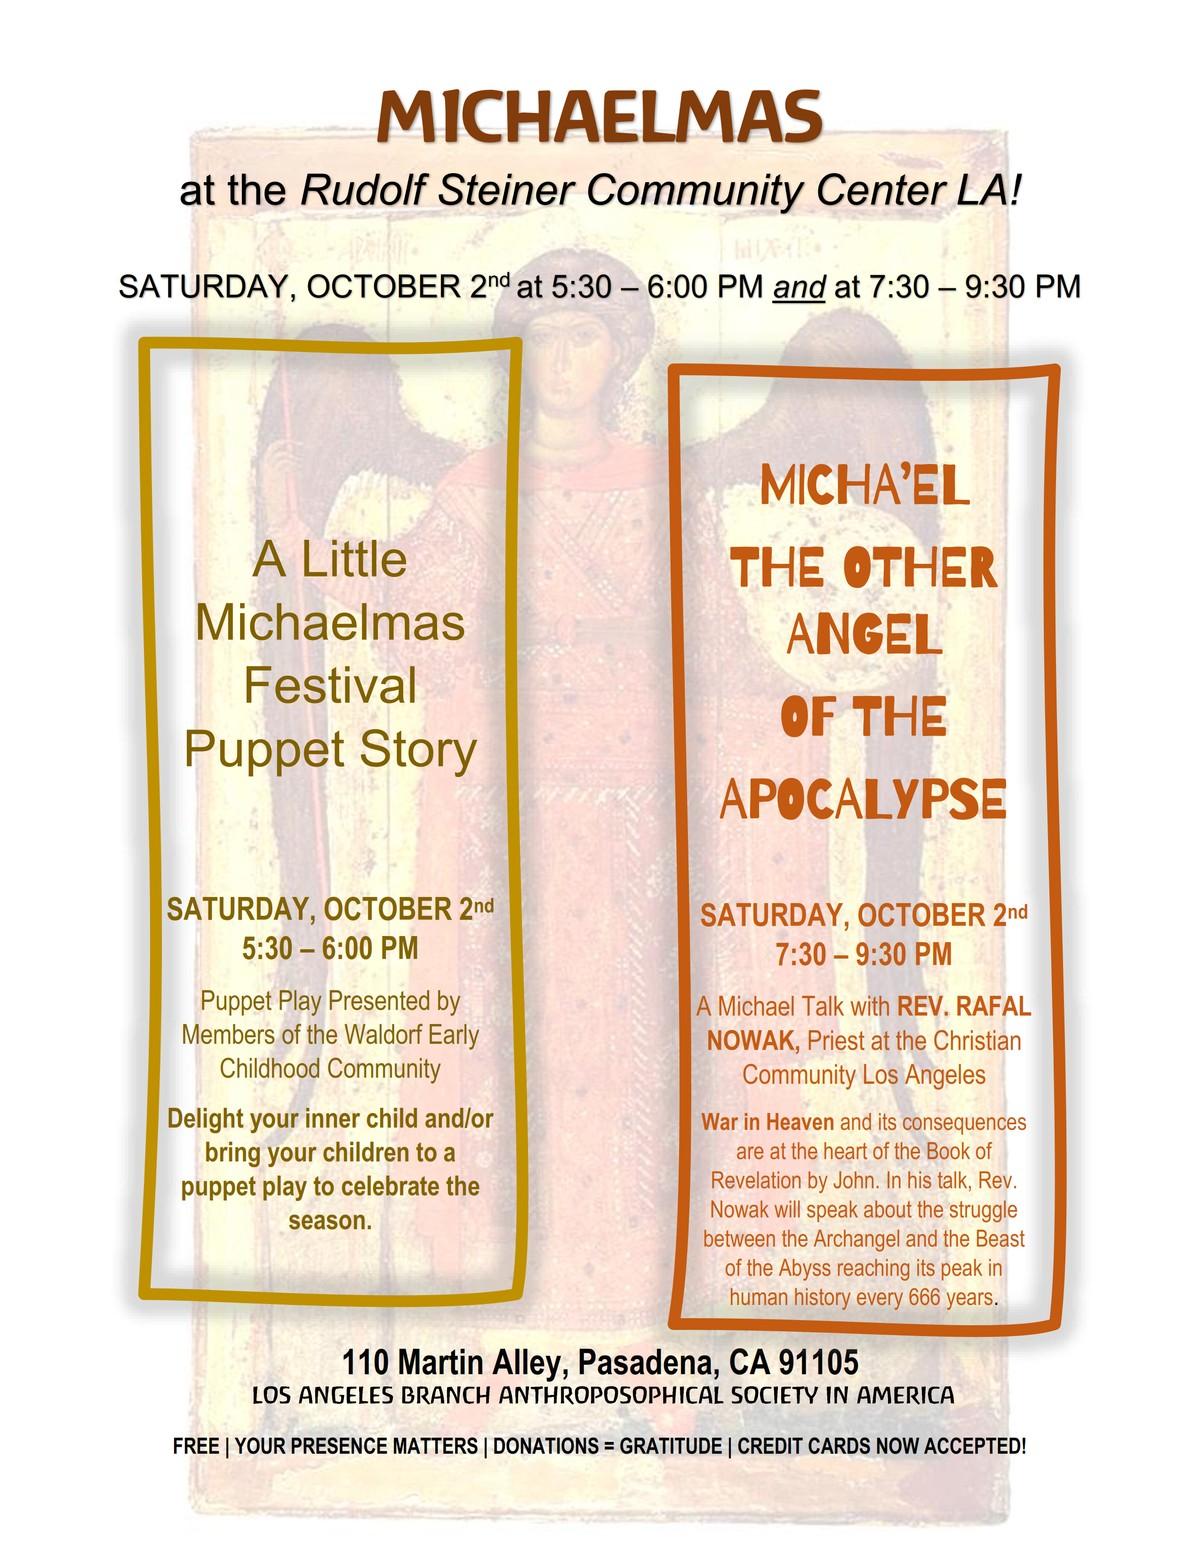 Michaelmas 2021 in Los Angeles and Pasadena